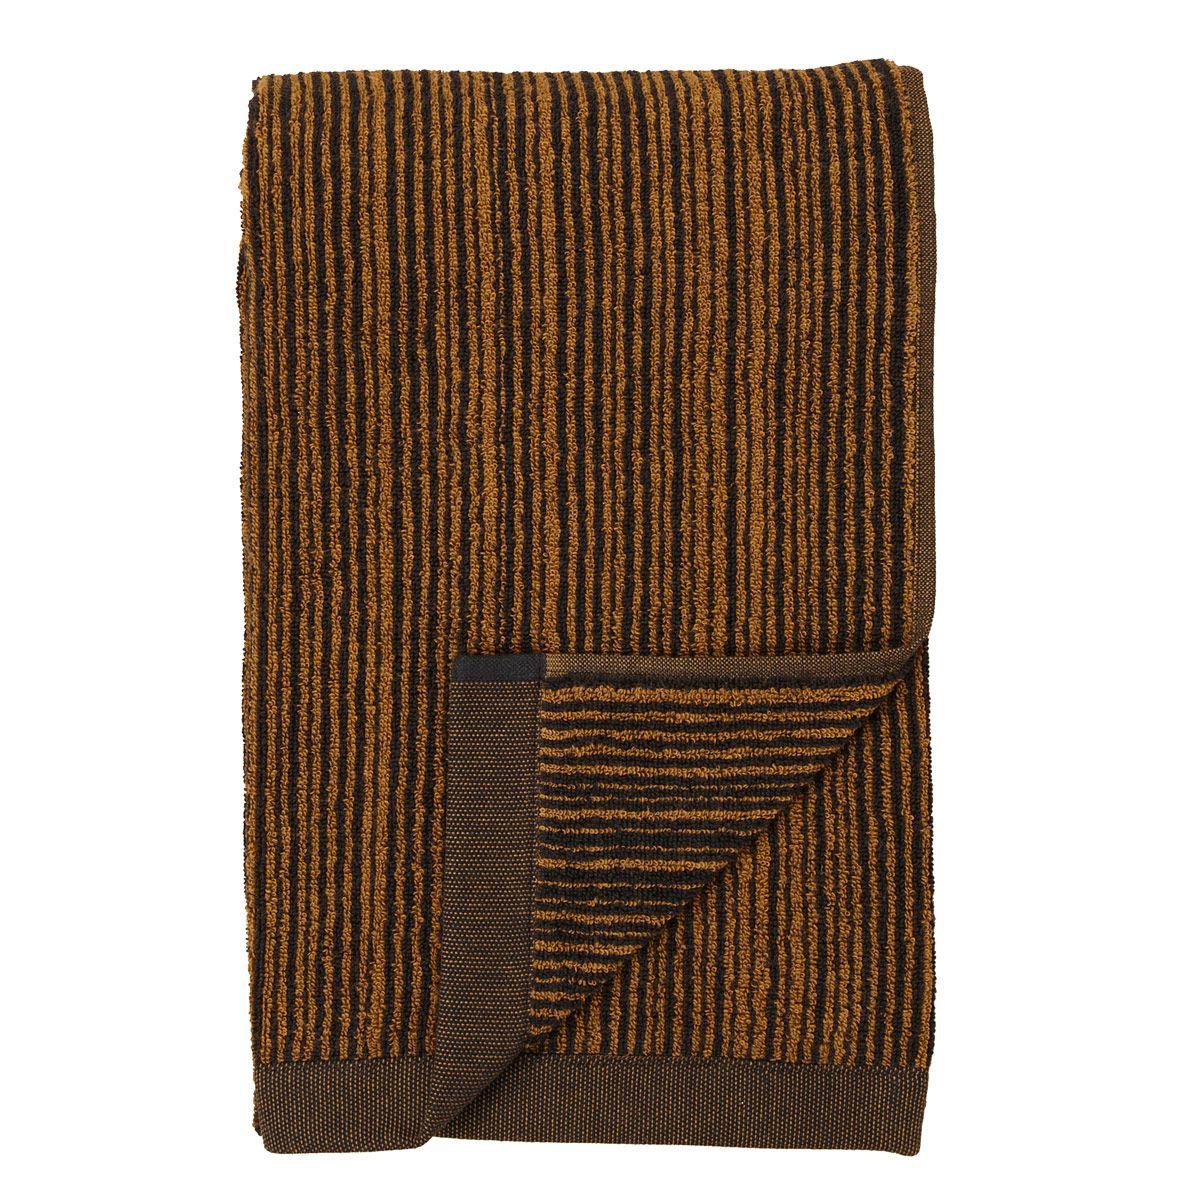 Marimekko Varvunraita Black Brown Bath Towel Brown Bath Towels